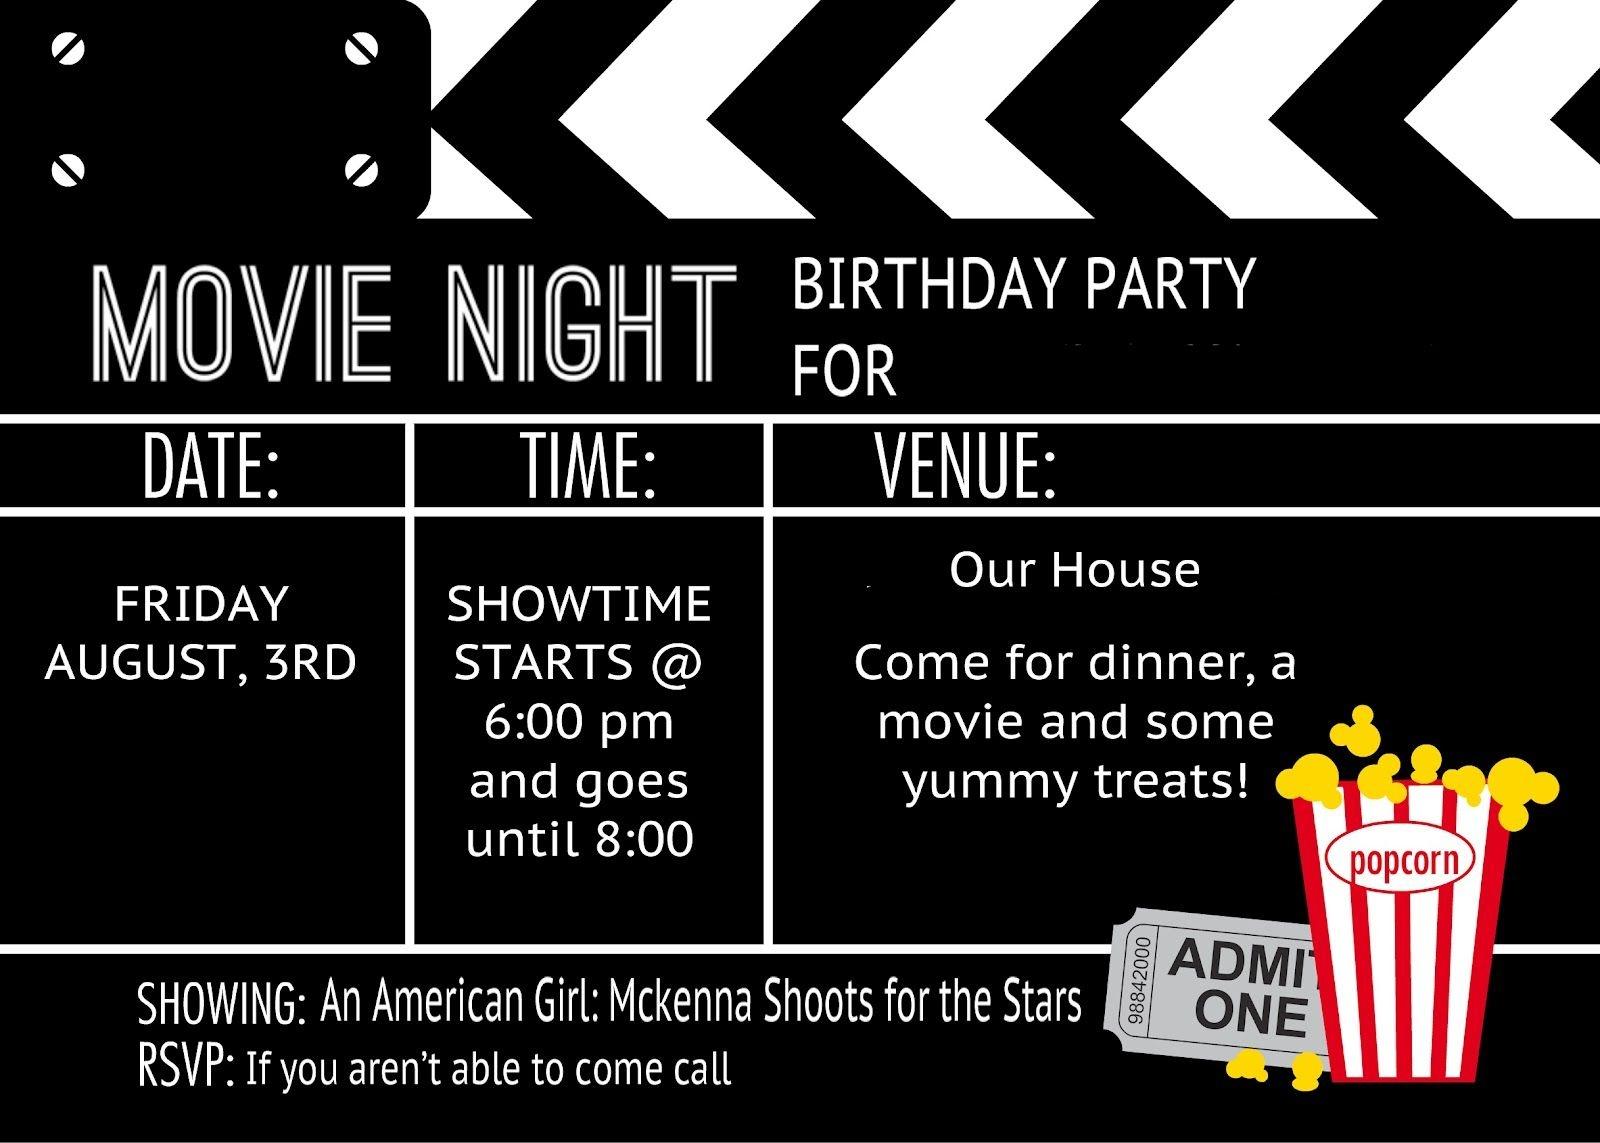 Birthday Party Invitation Templates Movie Theme | Kalli's 13Th - Movie Night Birthday Invitations Free Printable